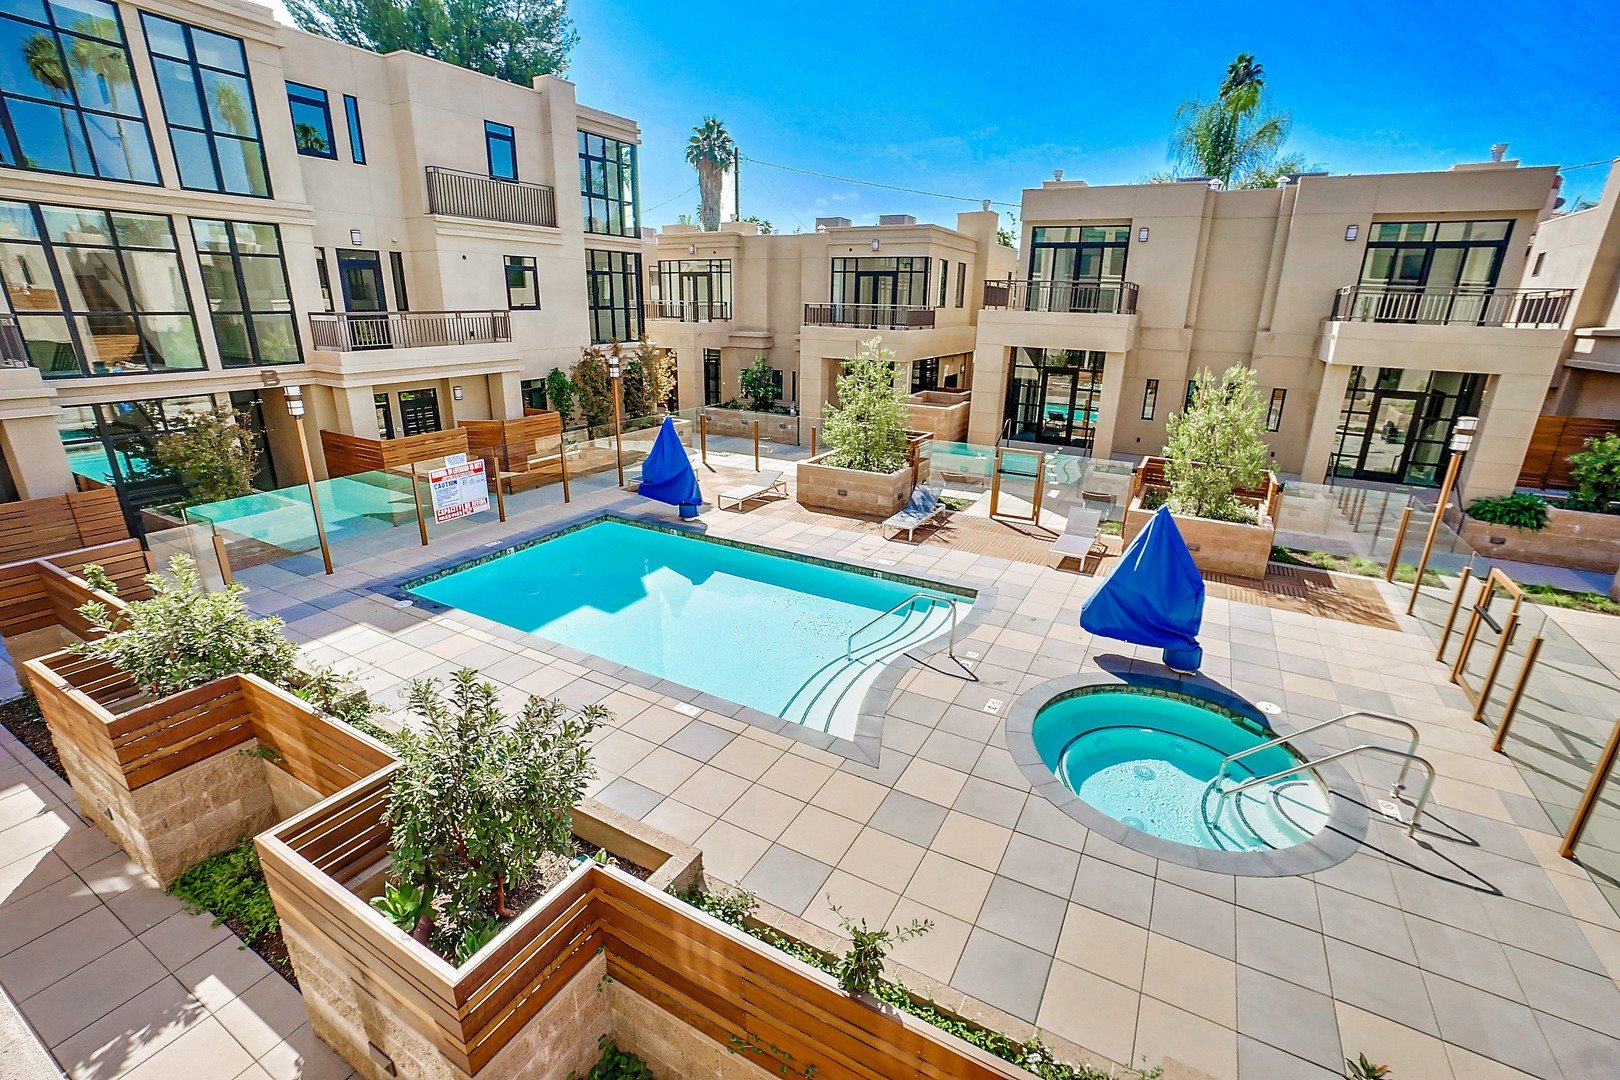 Apartments in Tarzana - The Residences at Village Walk Pool